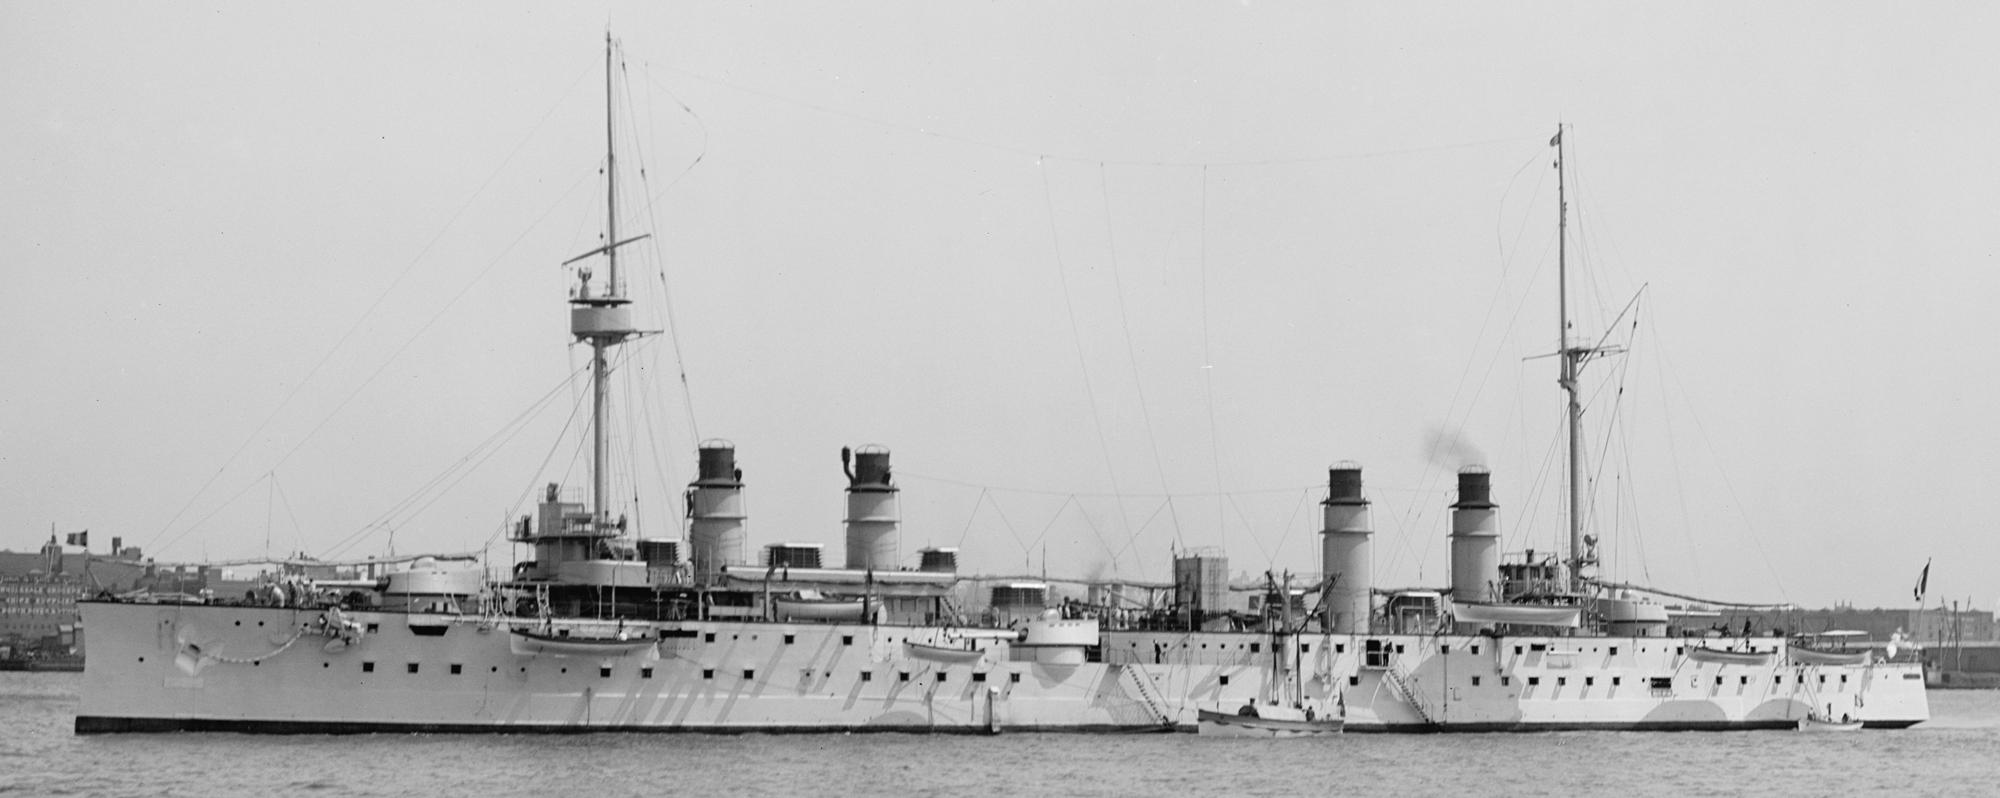 WW1 French Cruisers